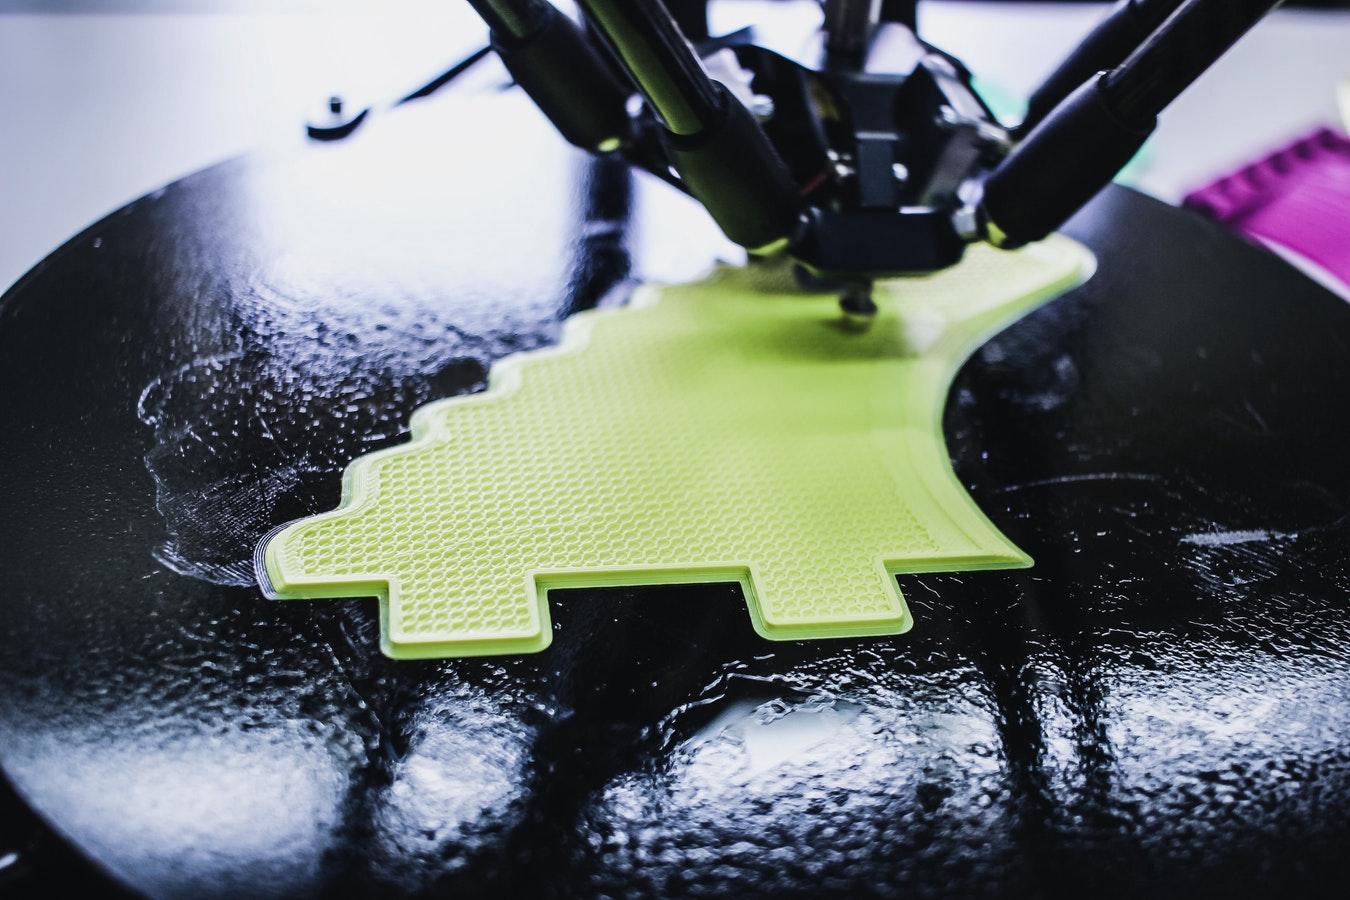 Impact of 3D printing Australia